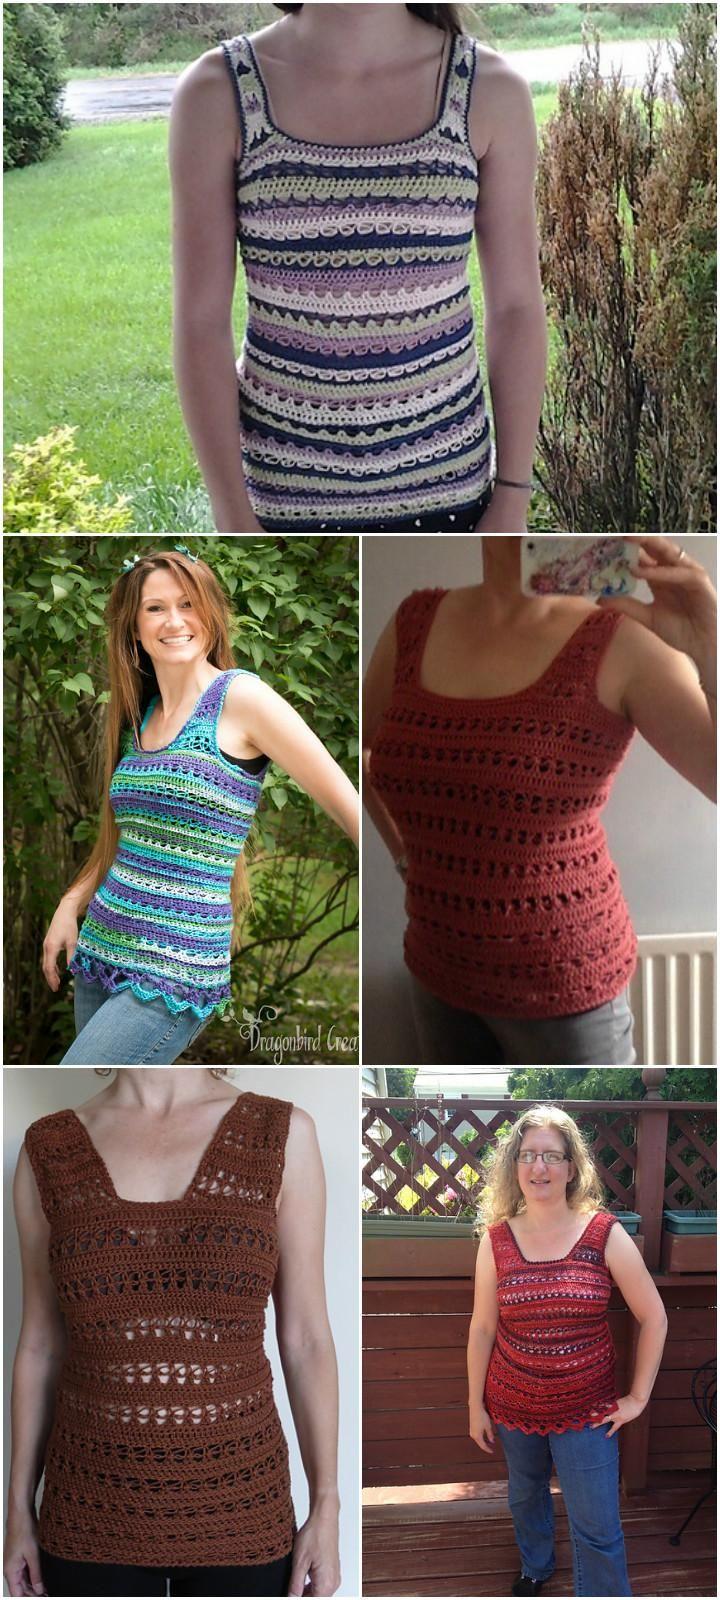 Crochet Summer Love Sleeveless Top - 50+ Quick & Easy Crochet Summer Tops - Free Patterns - DIY & Crafts